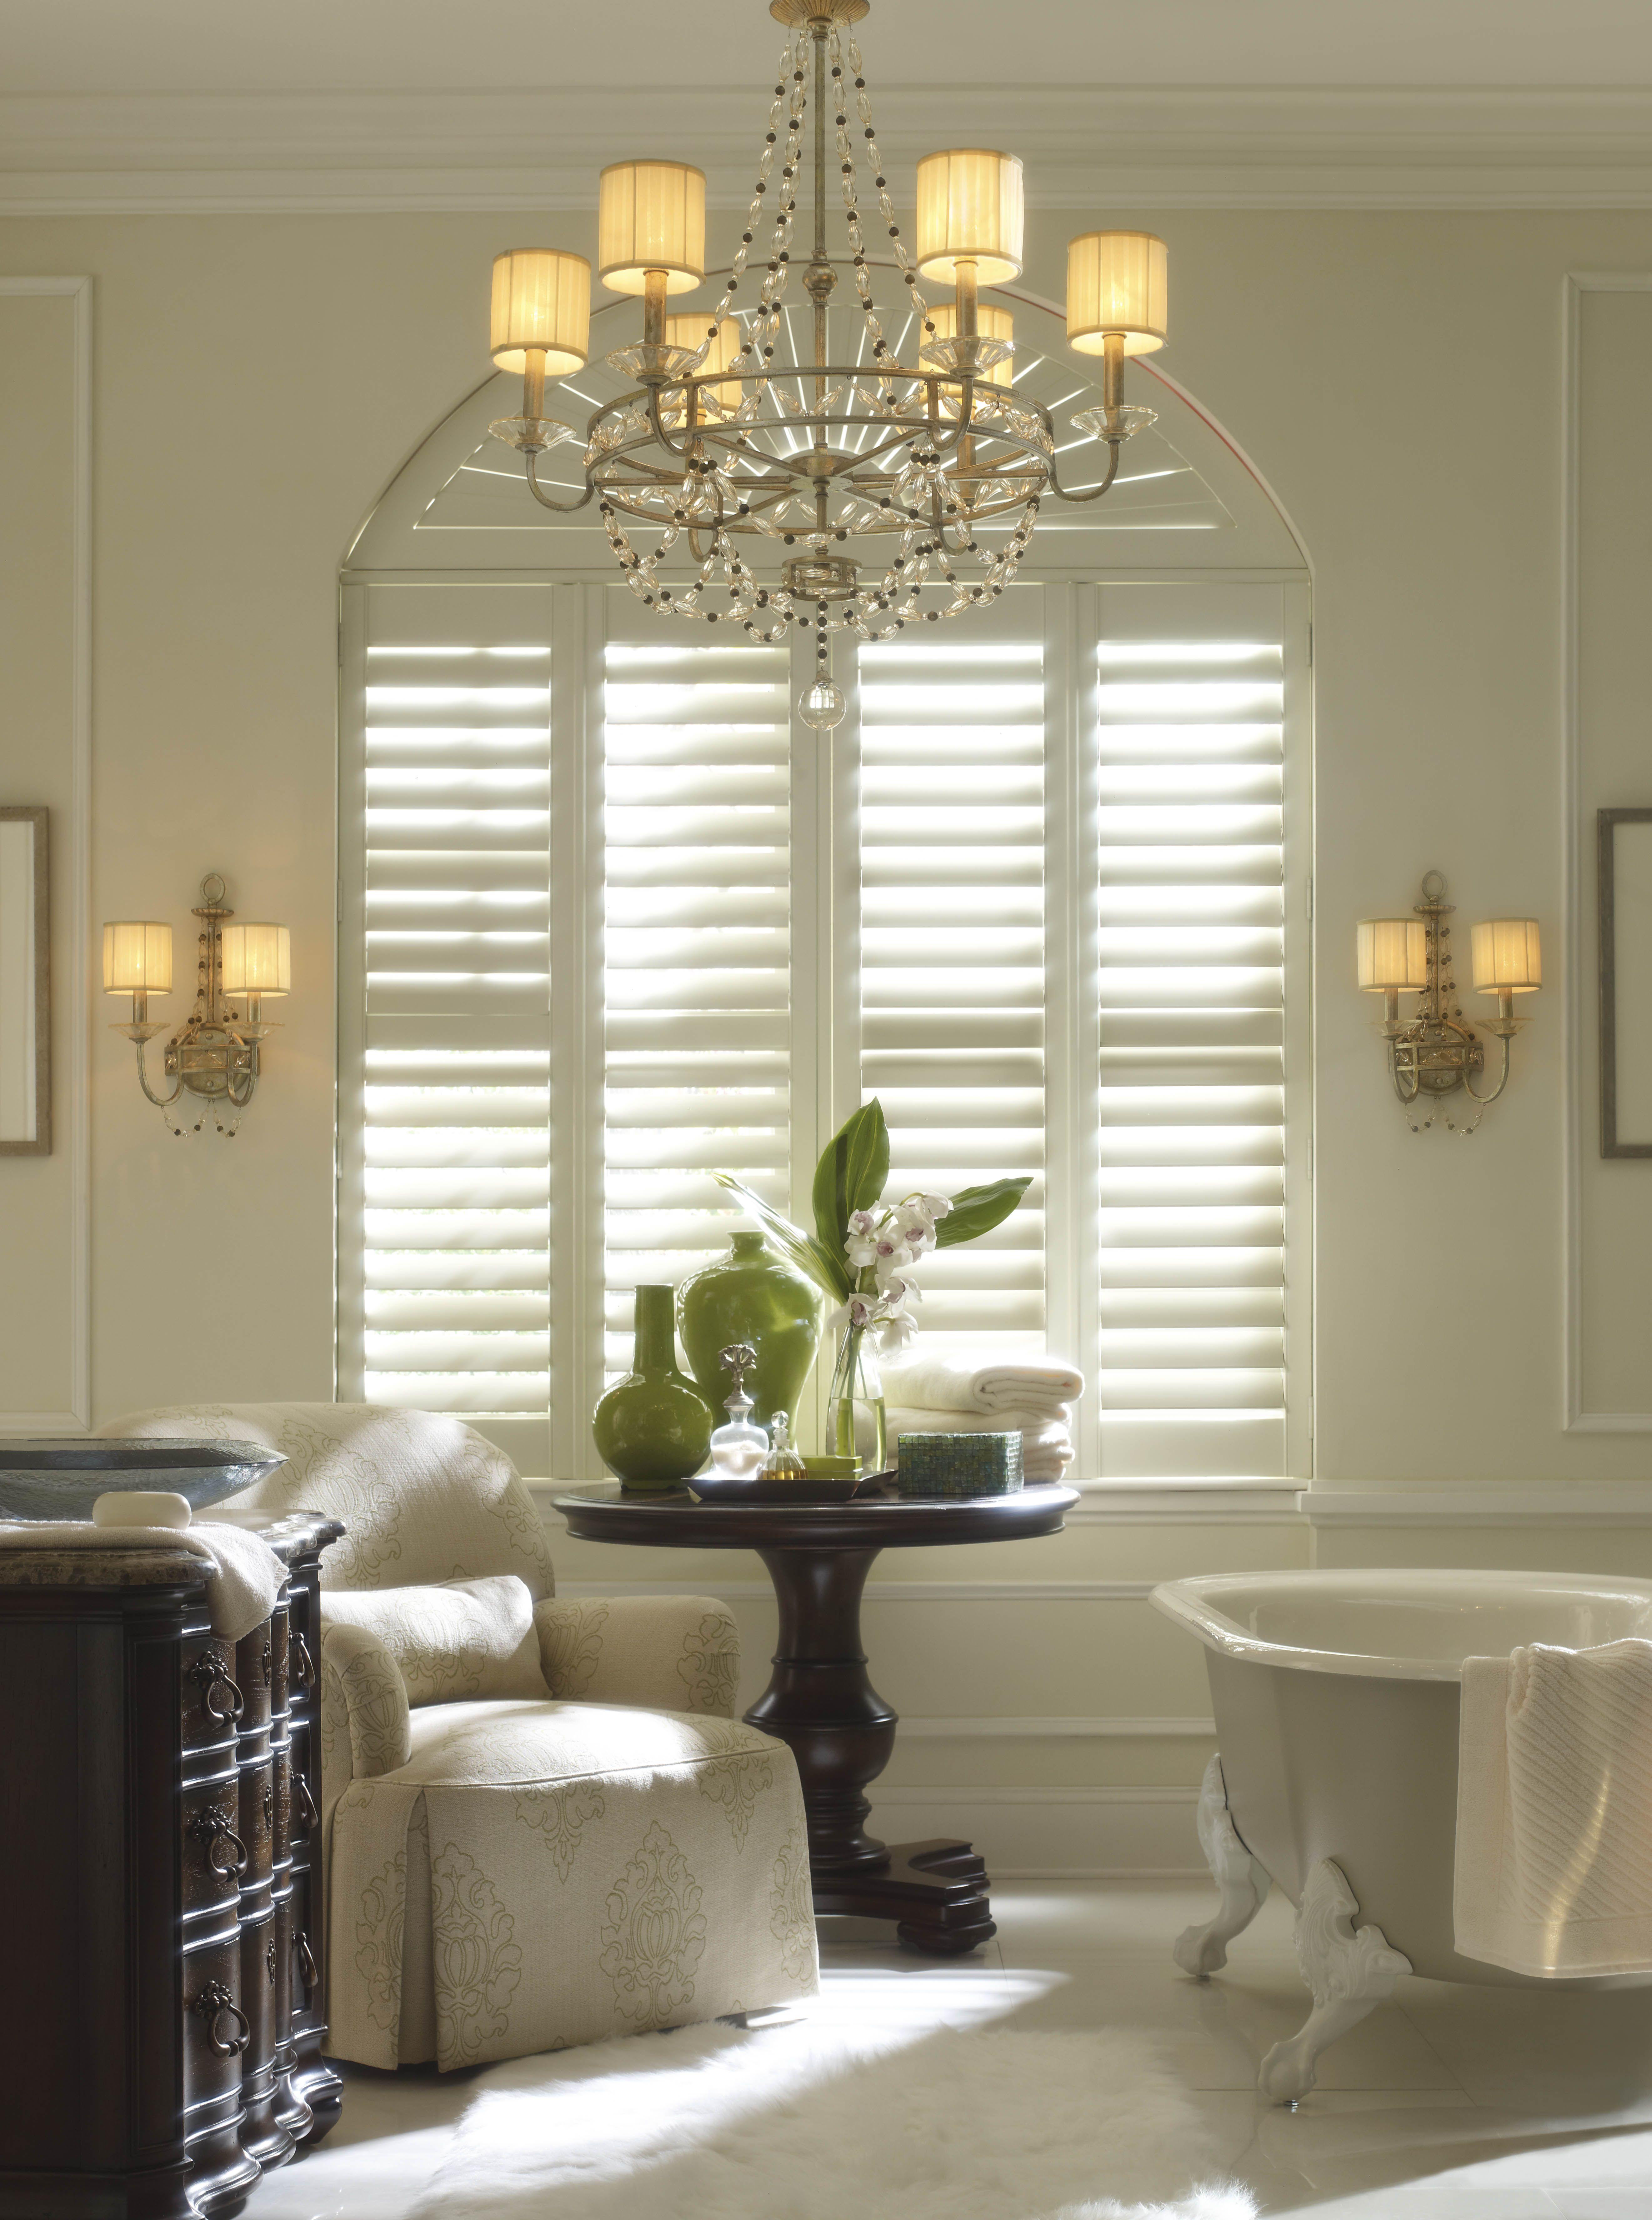 1000 images about chandeliers on pinterest hudson valley progress lighting and lighting bathroom lighting chandelier